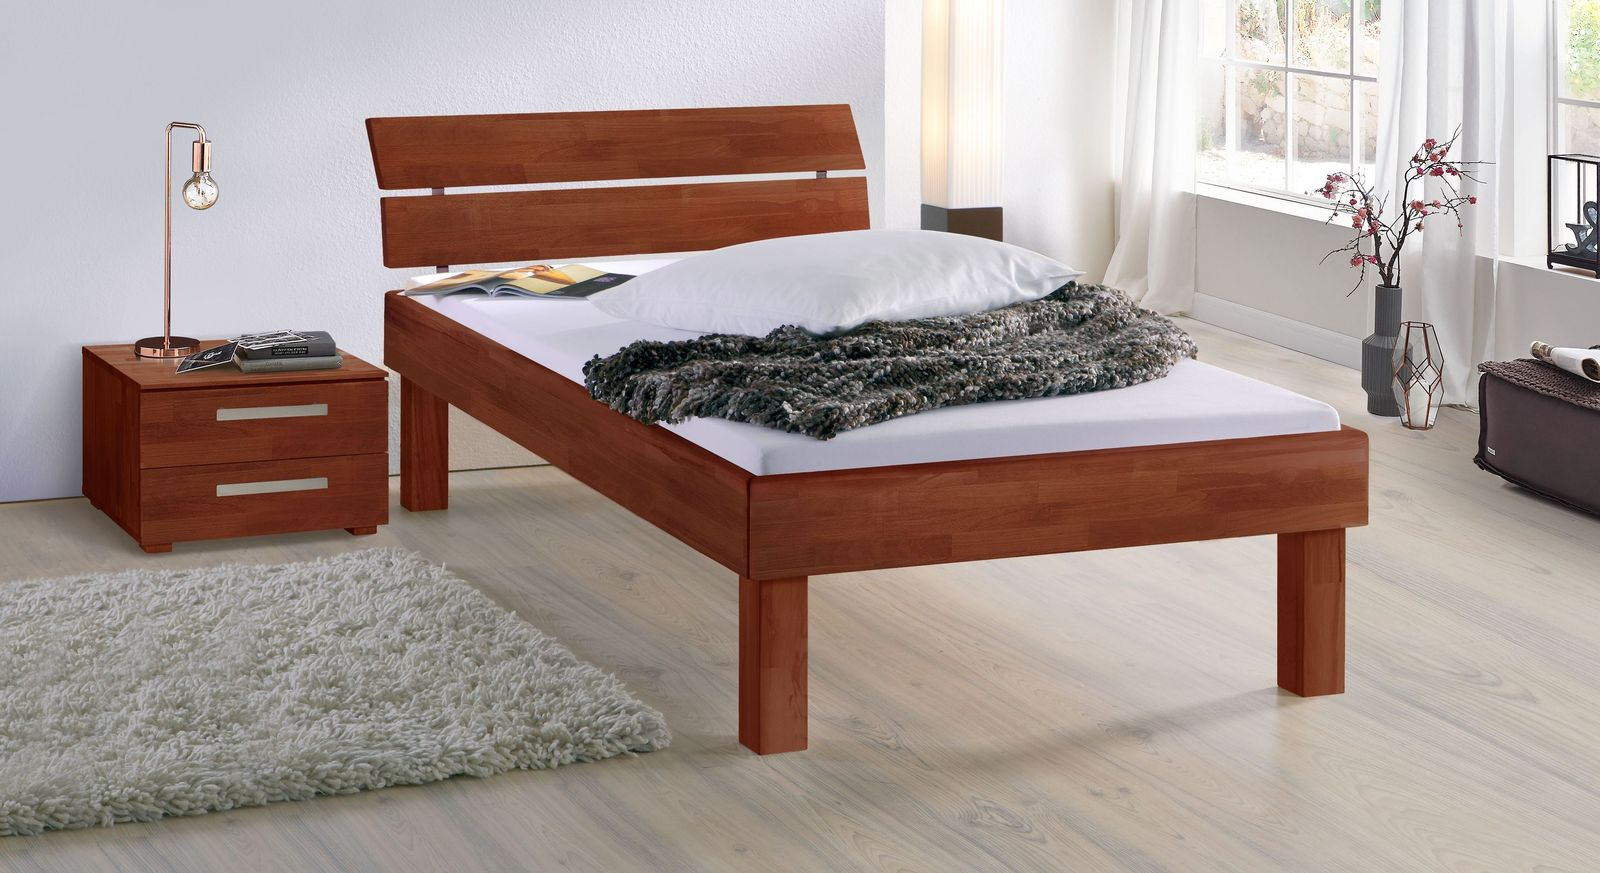 Kirschbaumfarbenes Bett Madrid Komfort in 30 cm Höhe